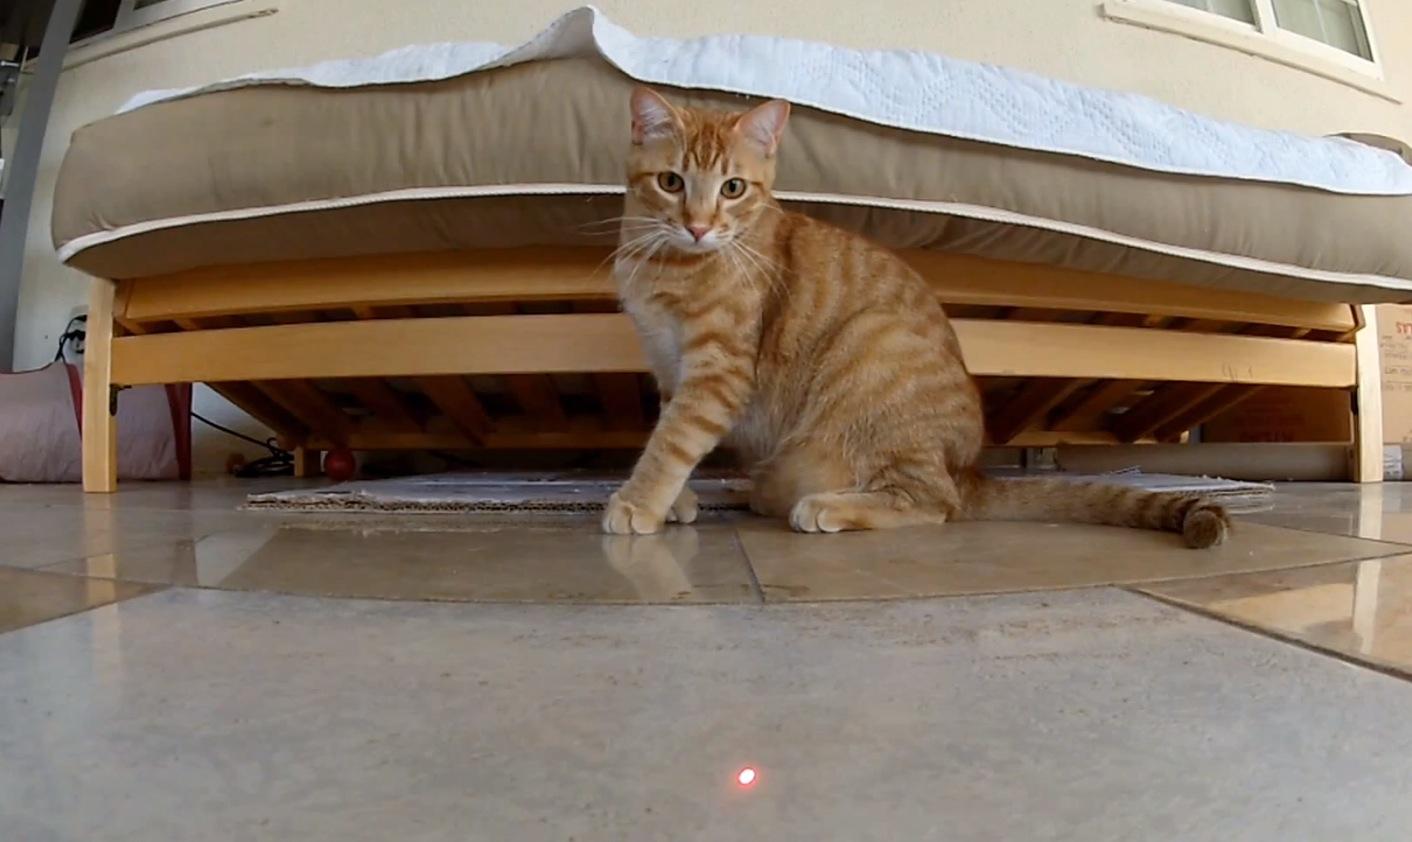 Laser Cats Meet GoPro